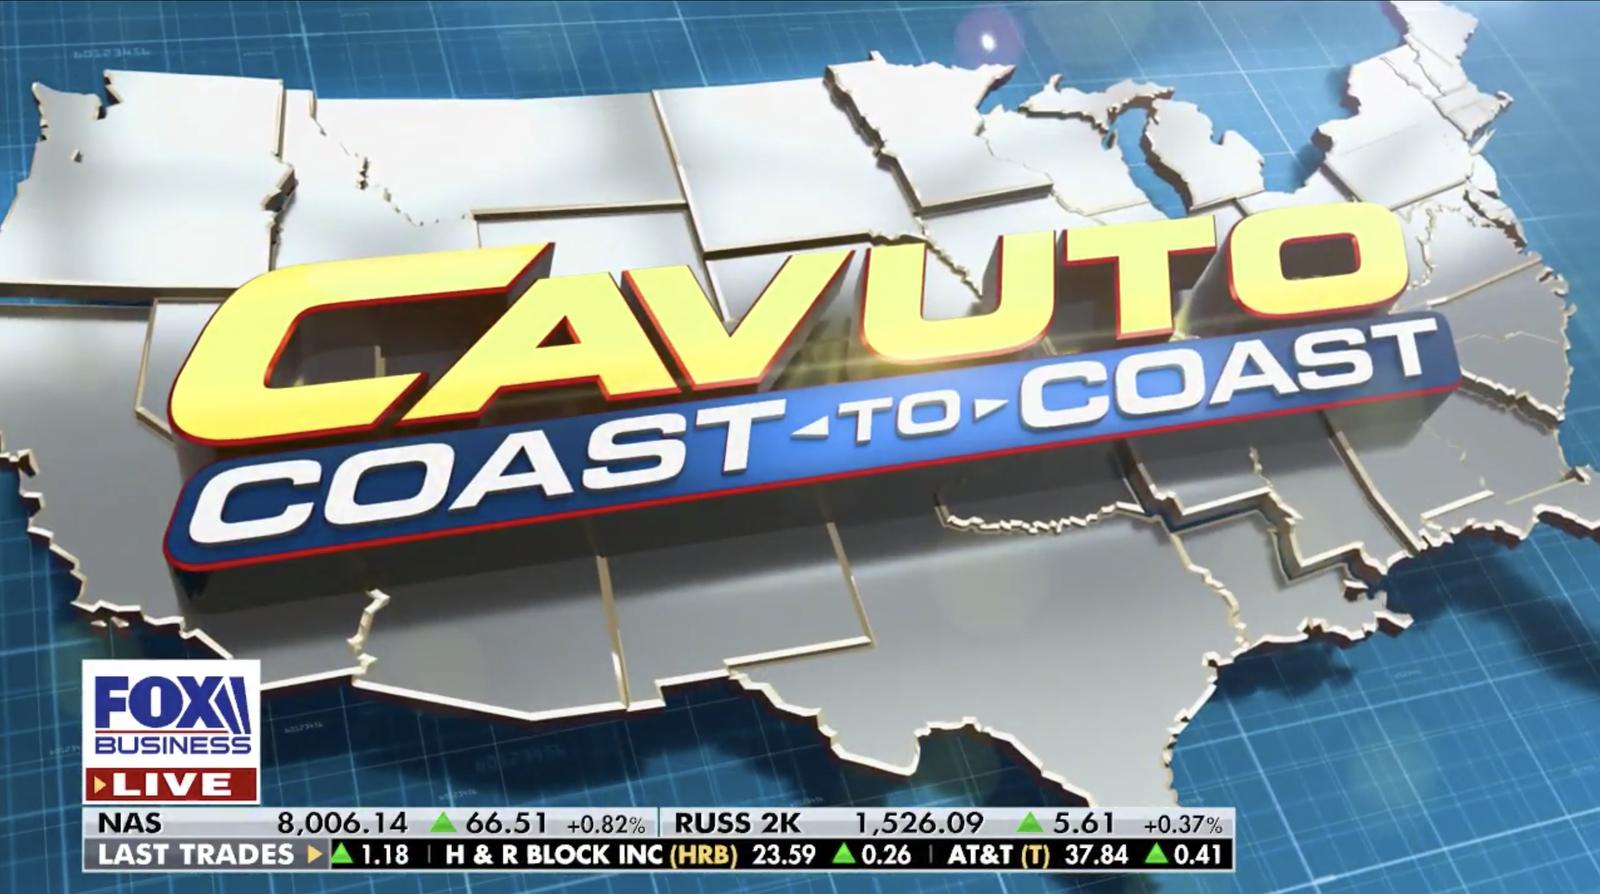 NCS_Fox-Business_Cavuto-Coast-to-Coast_Motion-Graphics_007